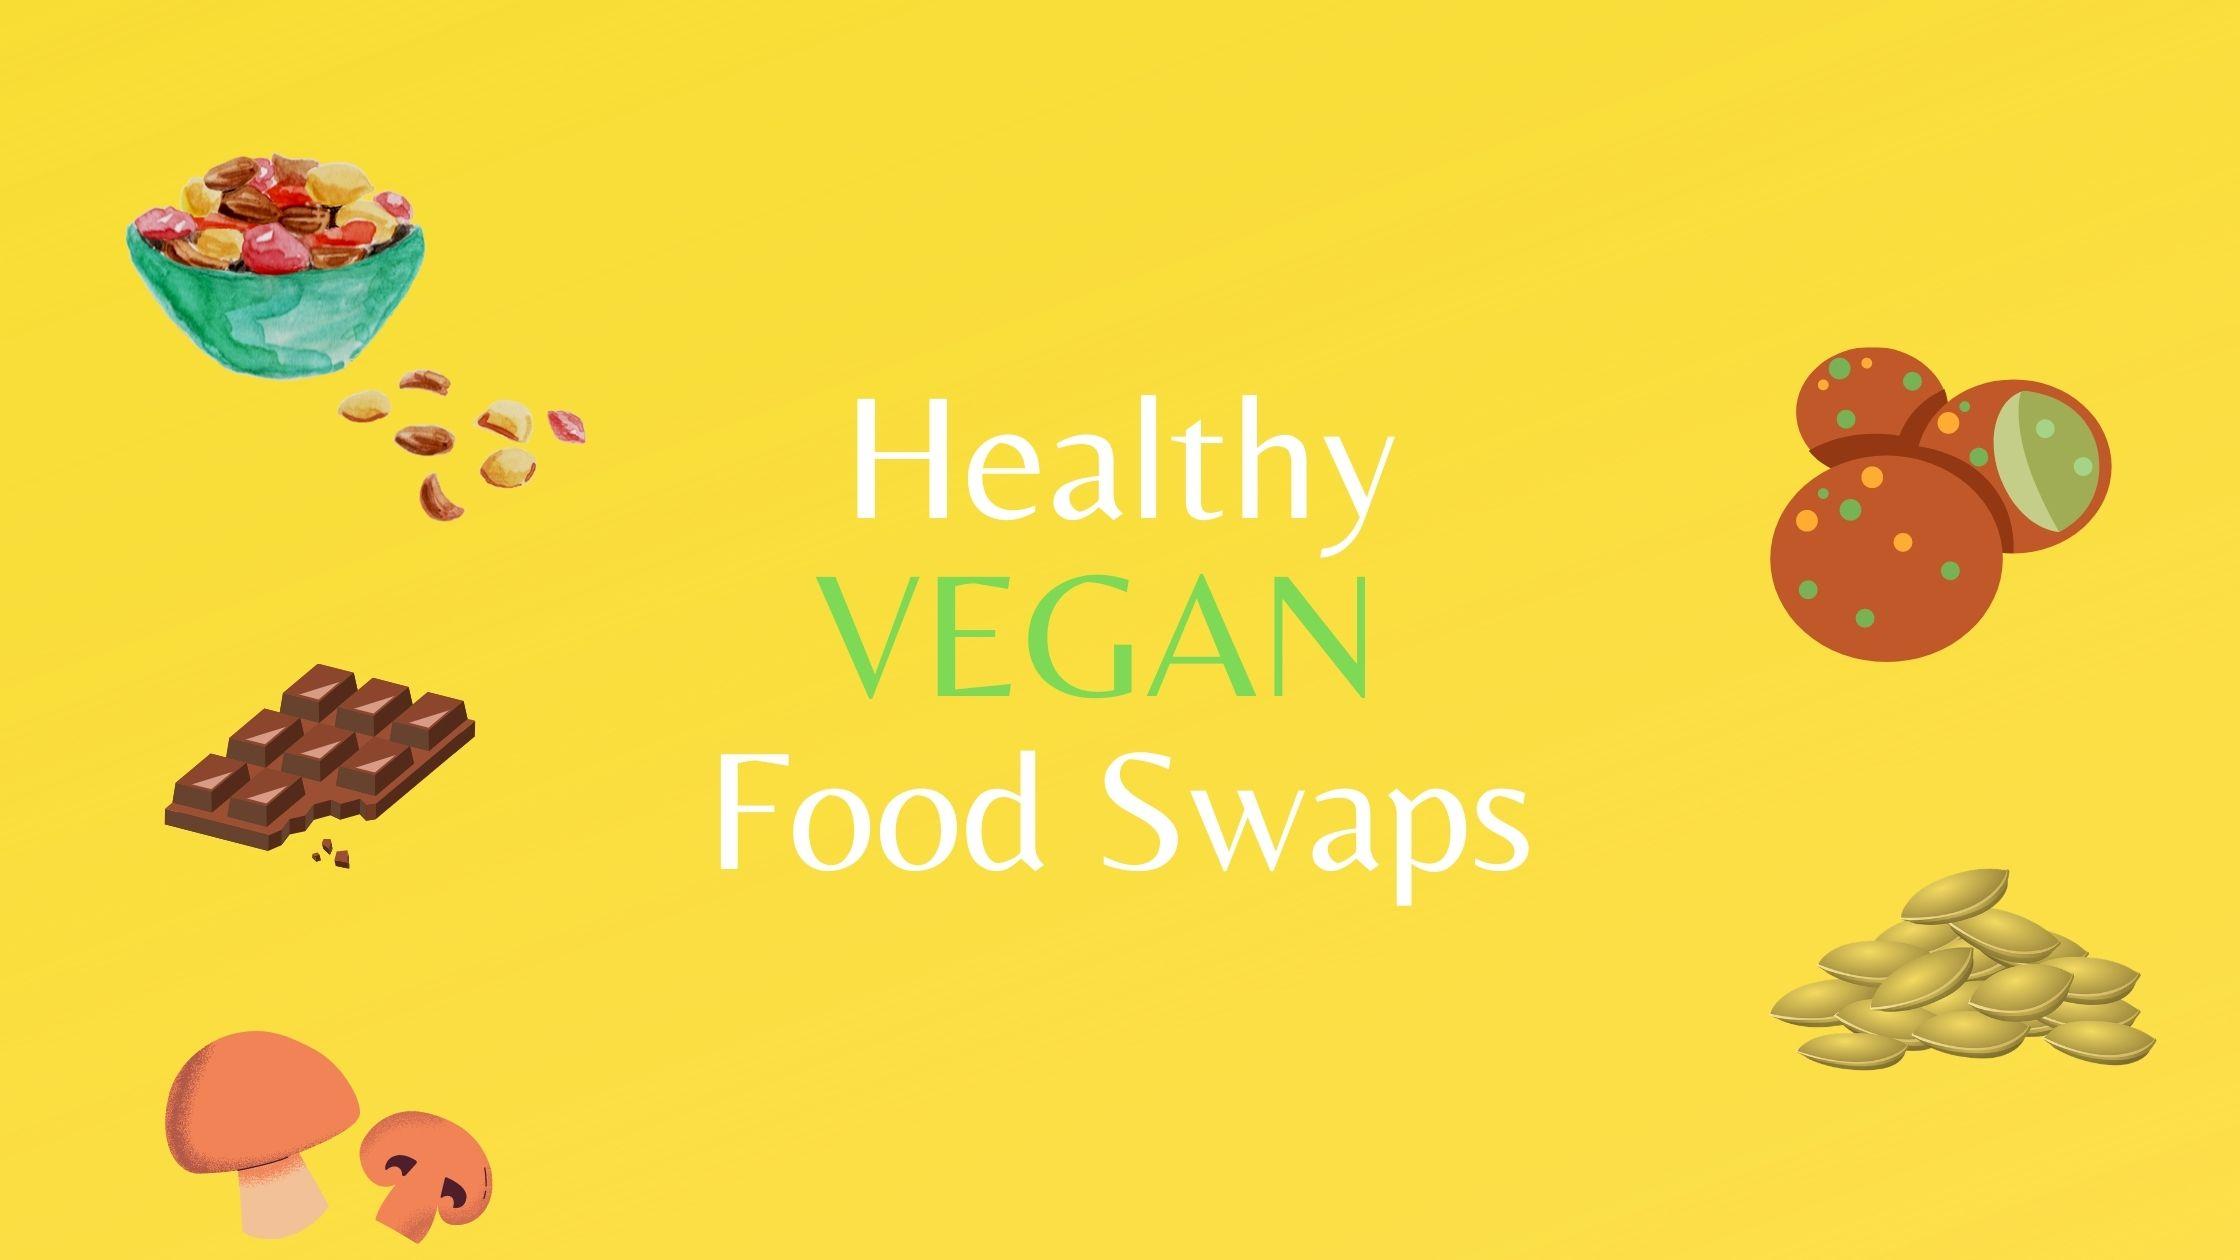 Healthy vegan food snack swaps